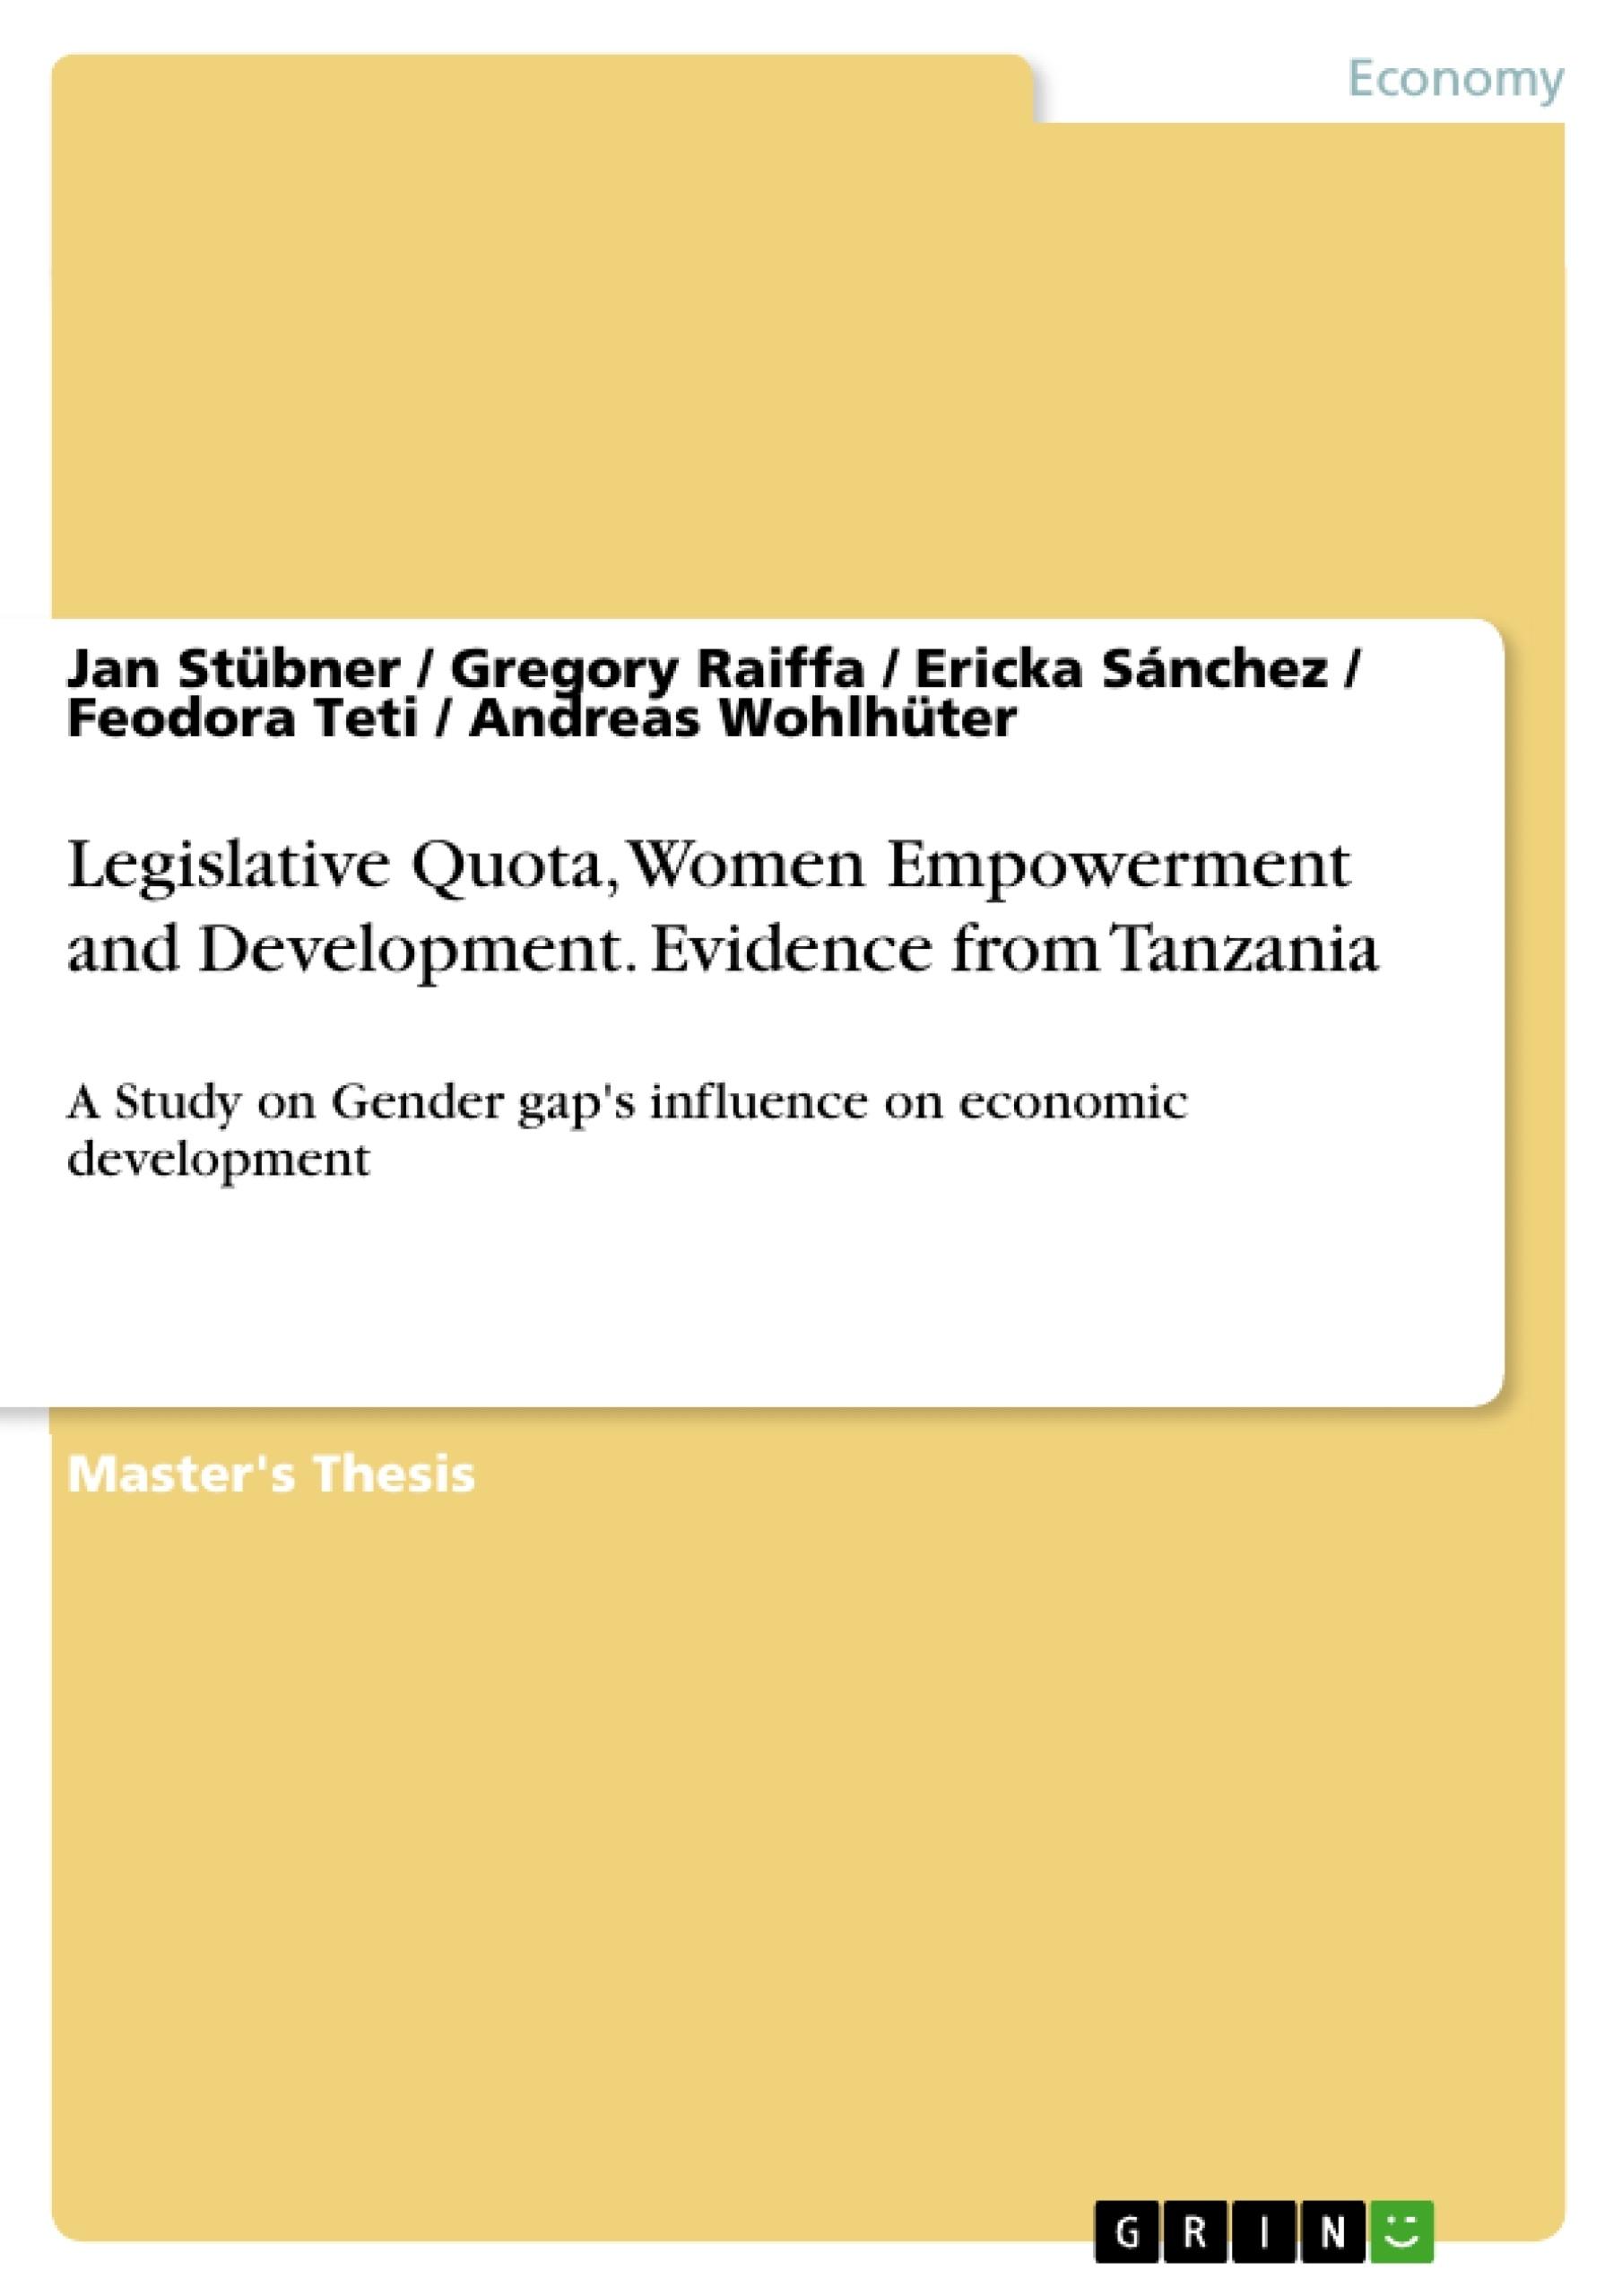 Title: Legislative Quota, Women Empowerment and Development. Evidence from Tanzania